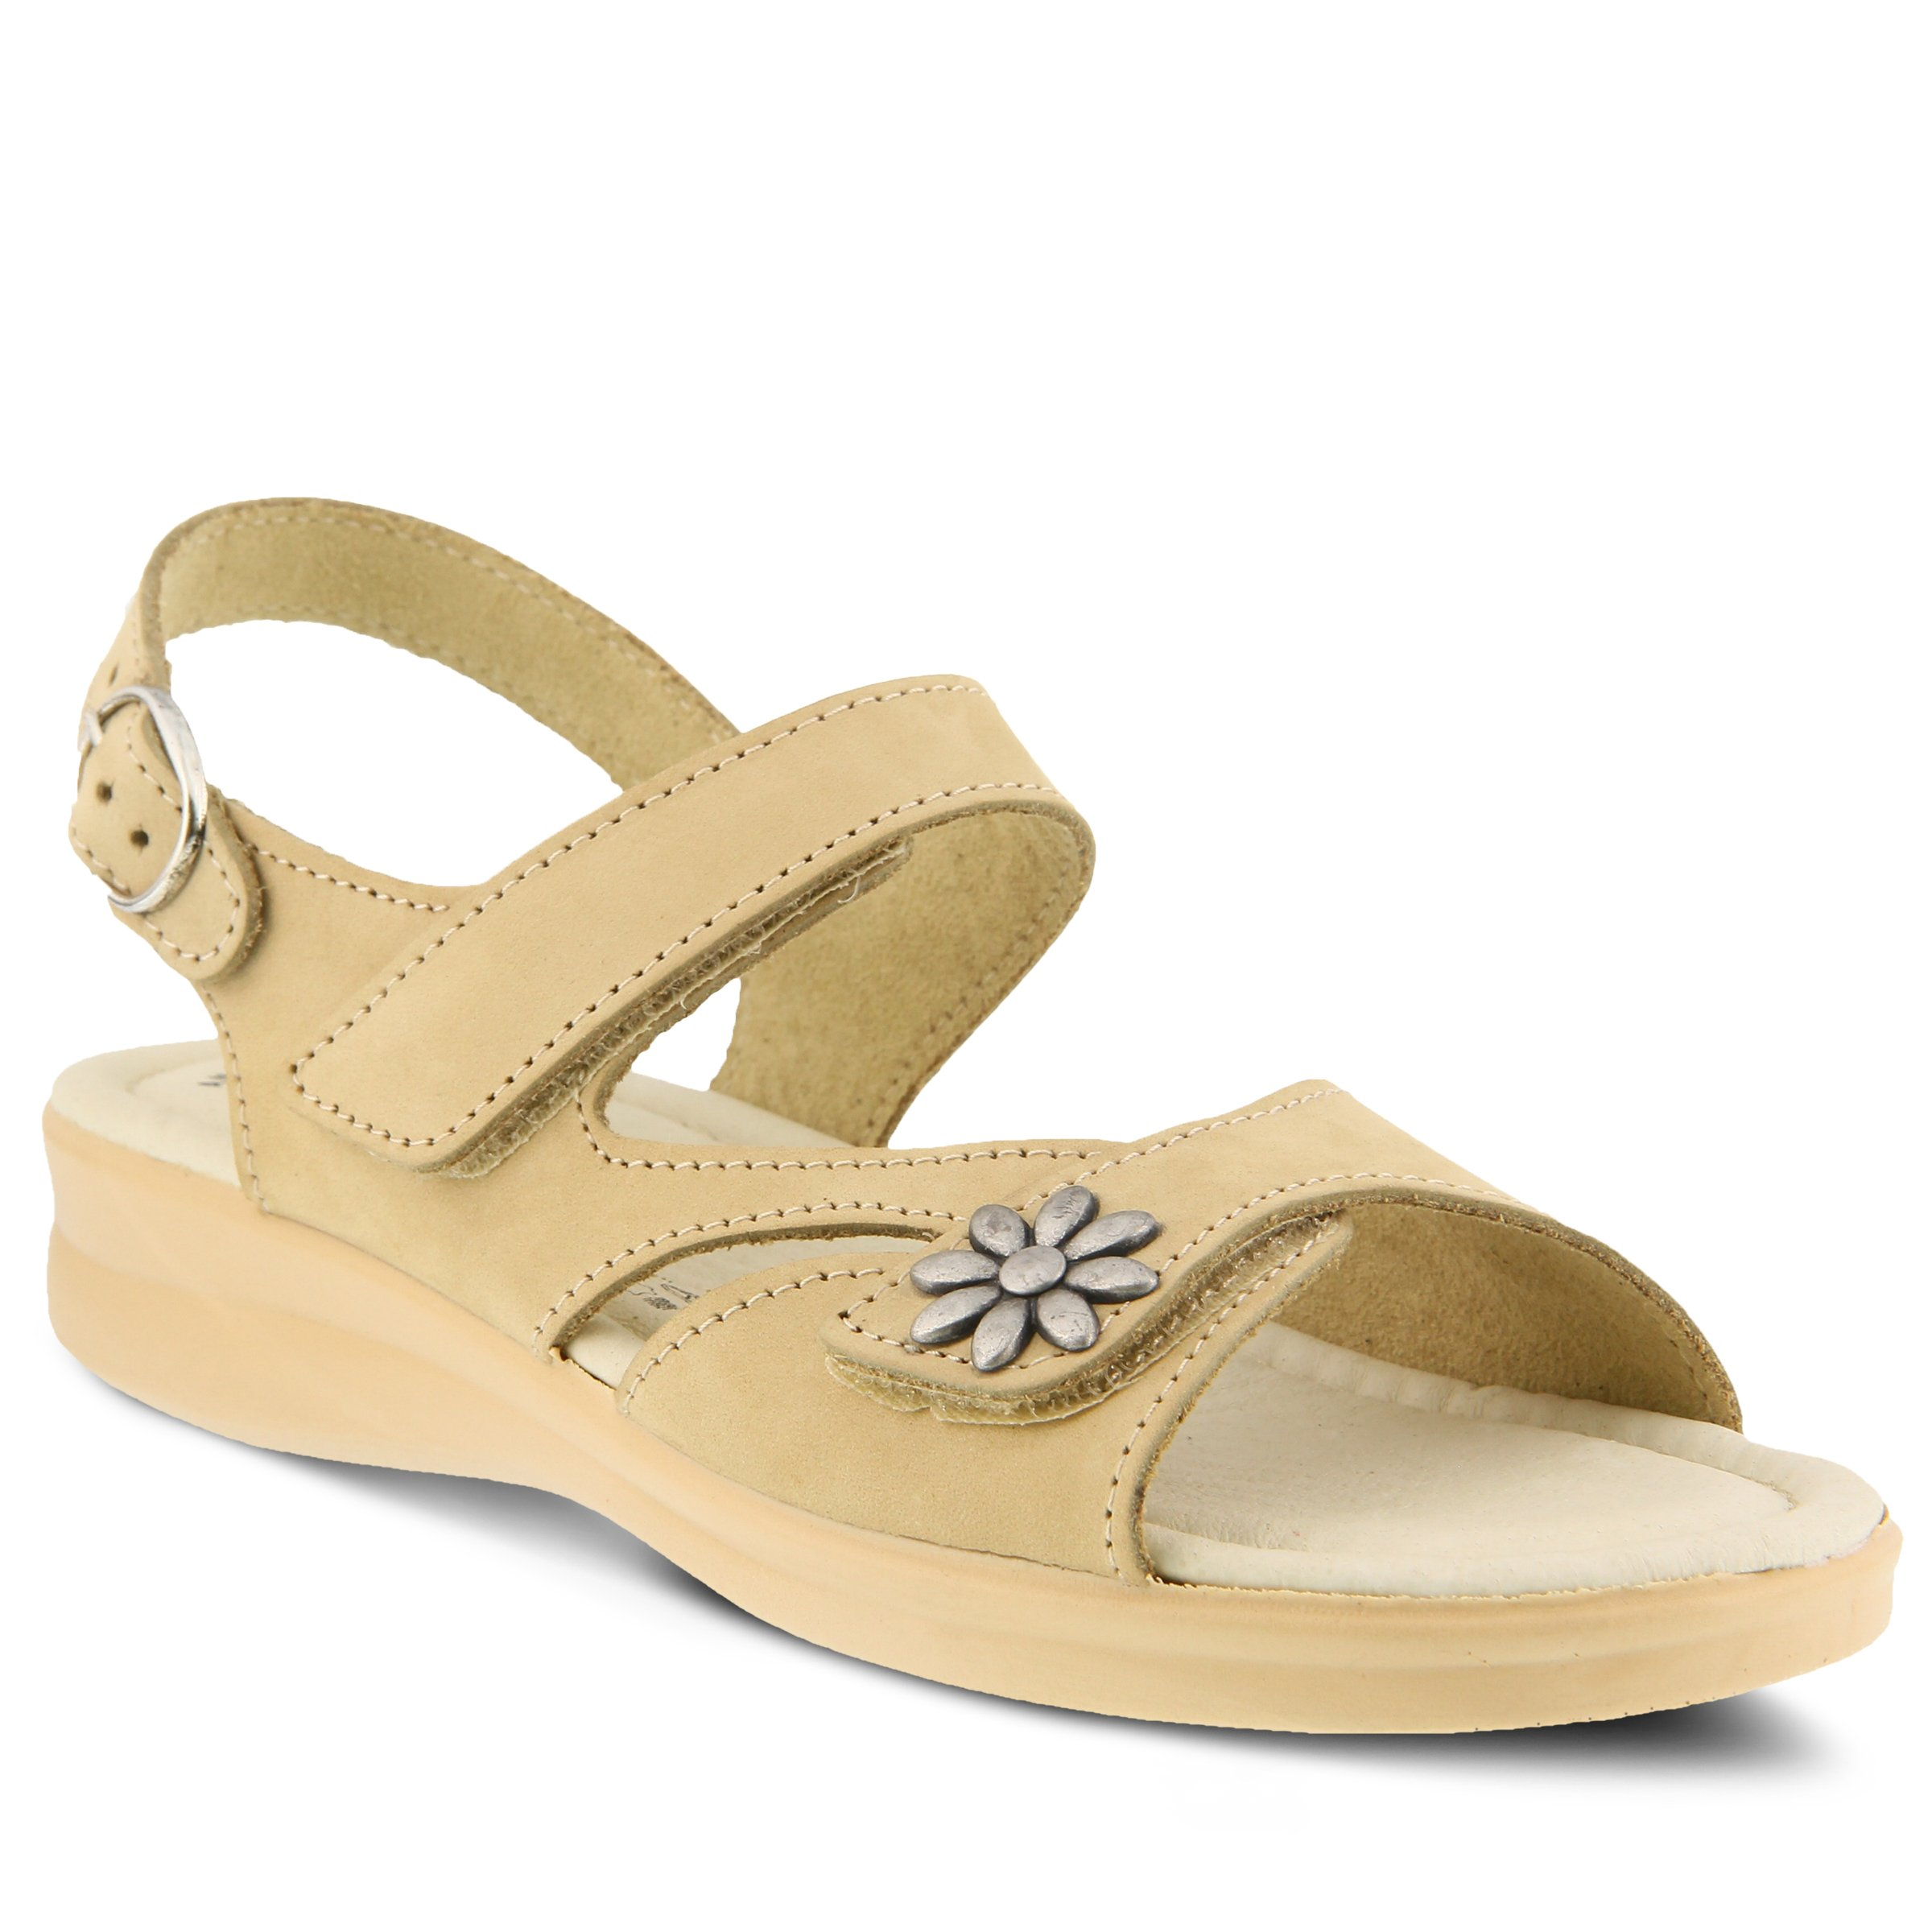 Flexus by Spring Step Womens Mukava Heeled Sandal